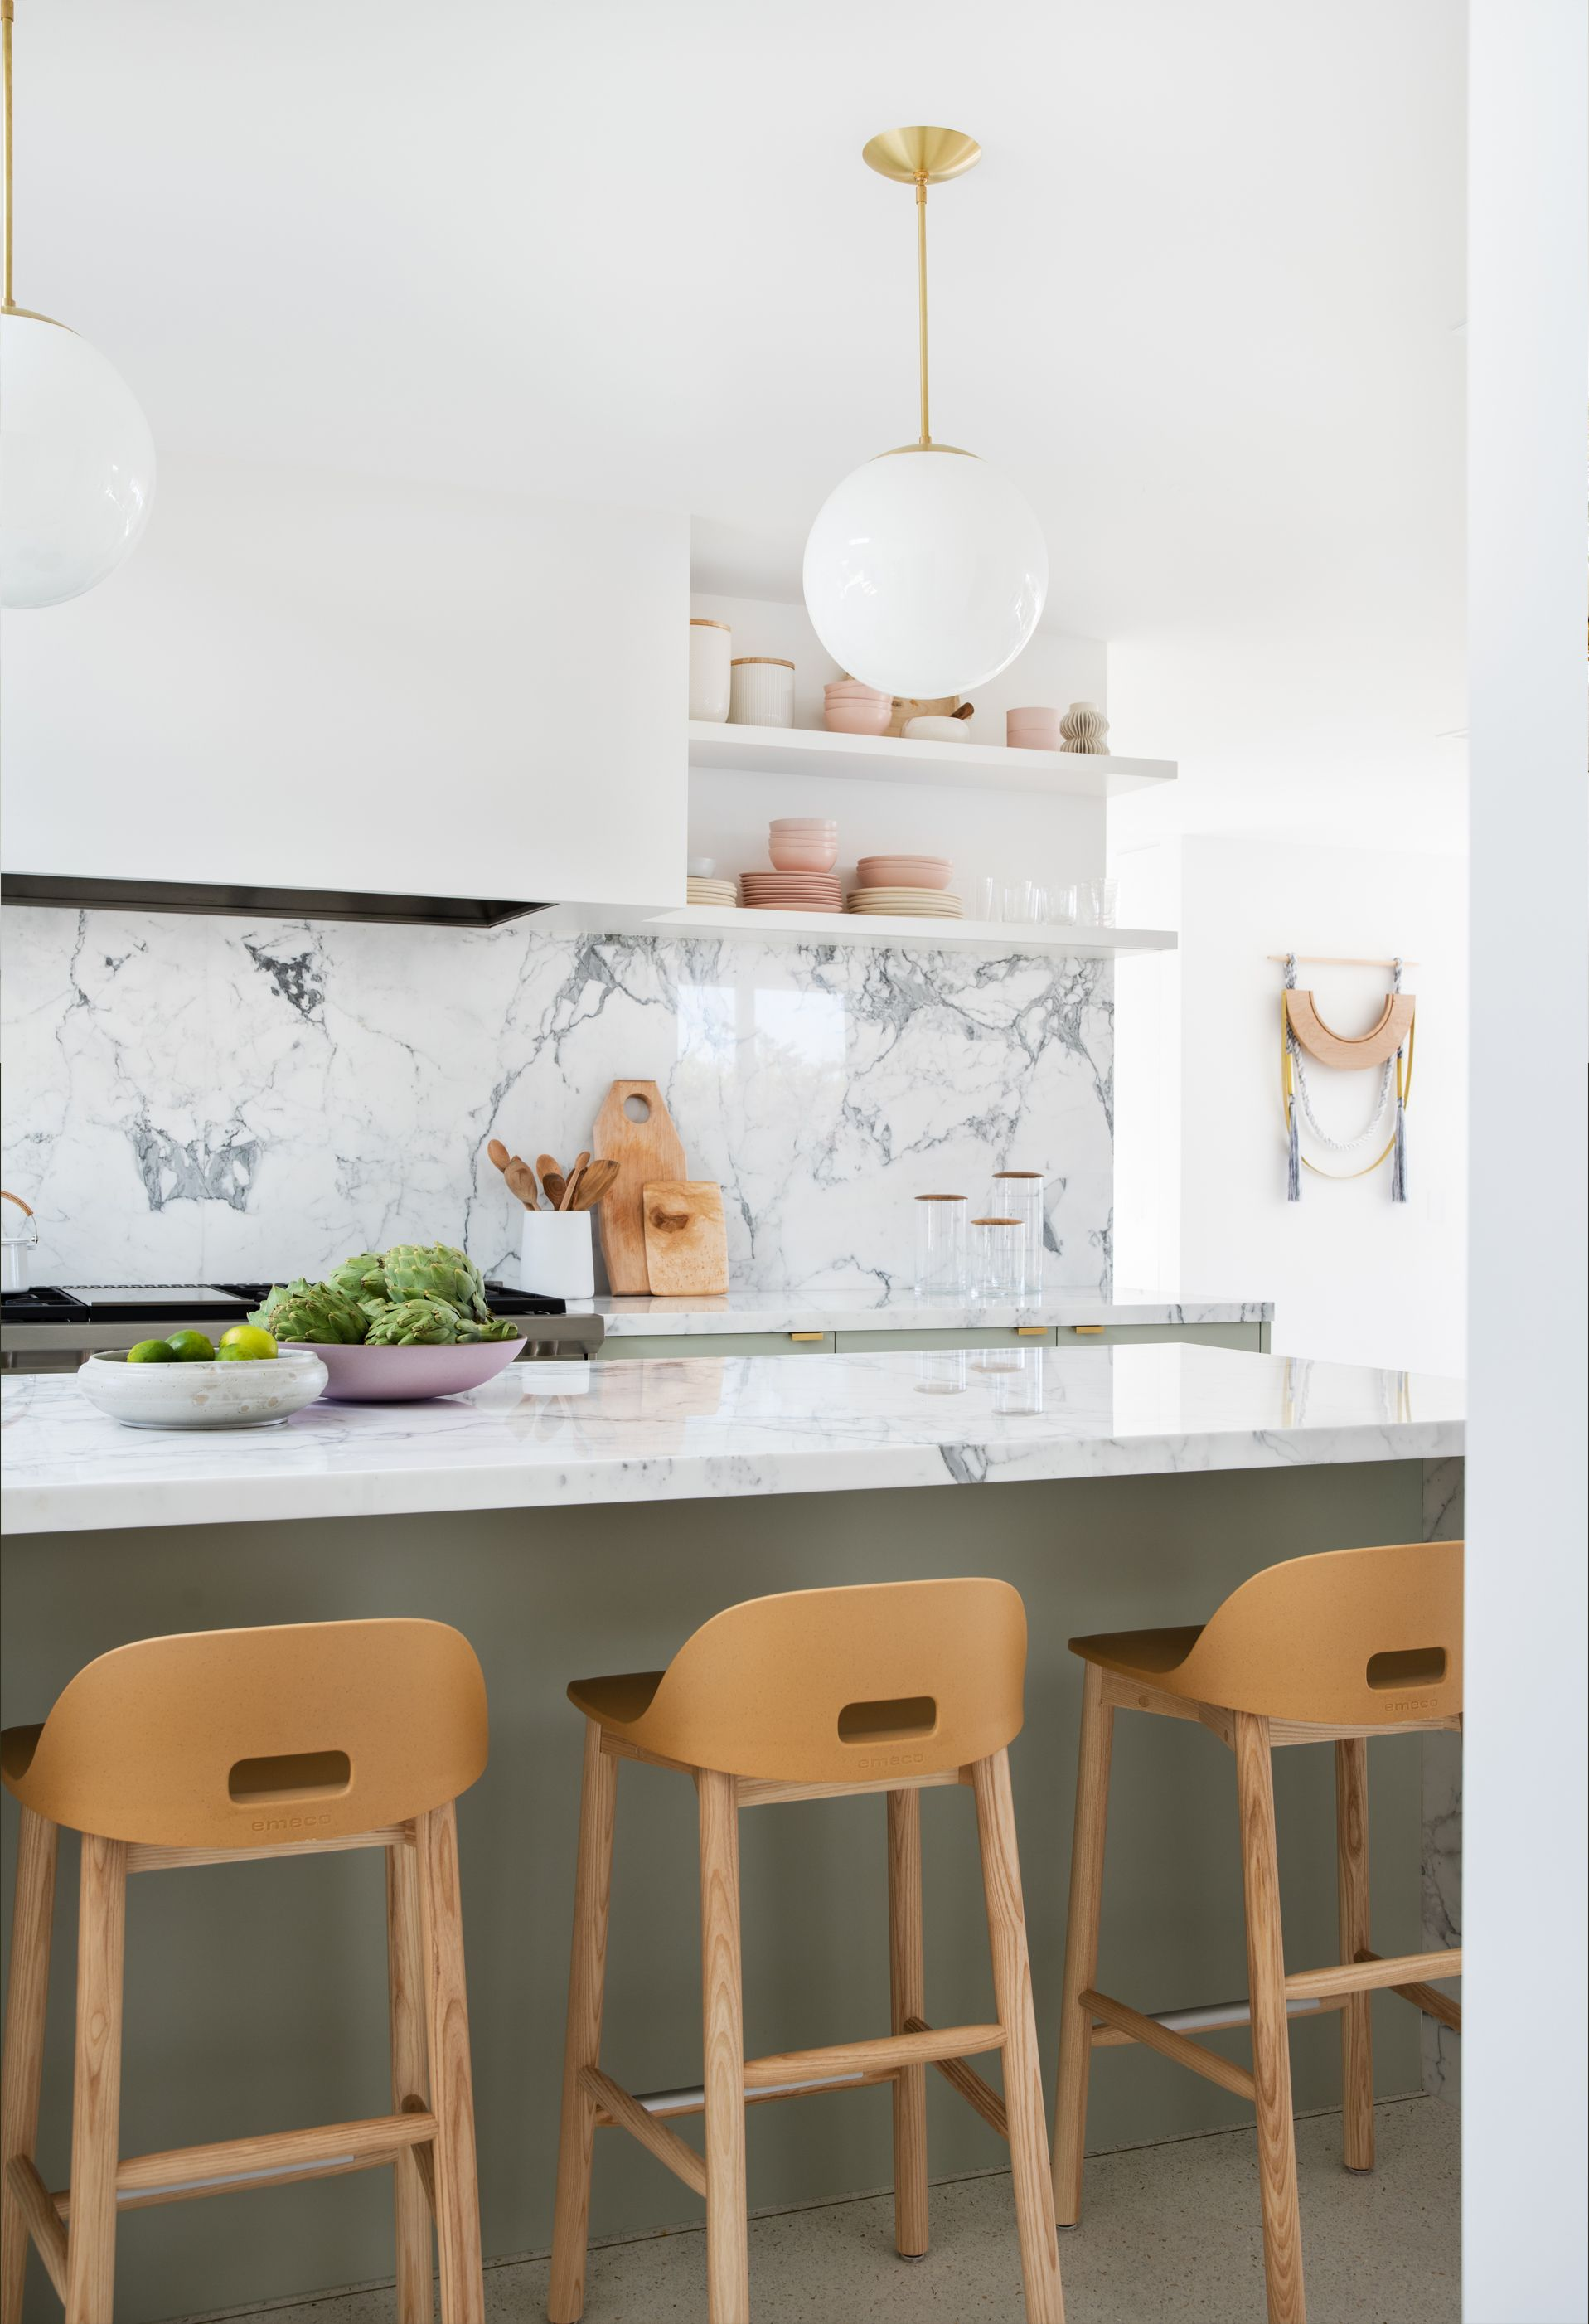 Sarah Sherman Samuel Moore S Mid Century Kitchen Design Small Kitchen Design Small Kitchen